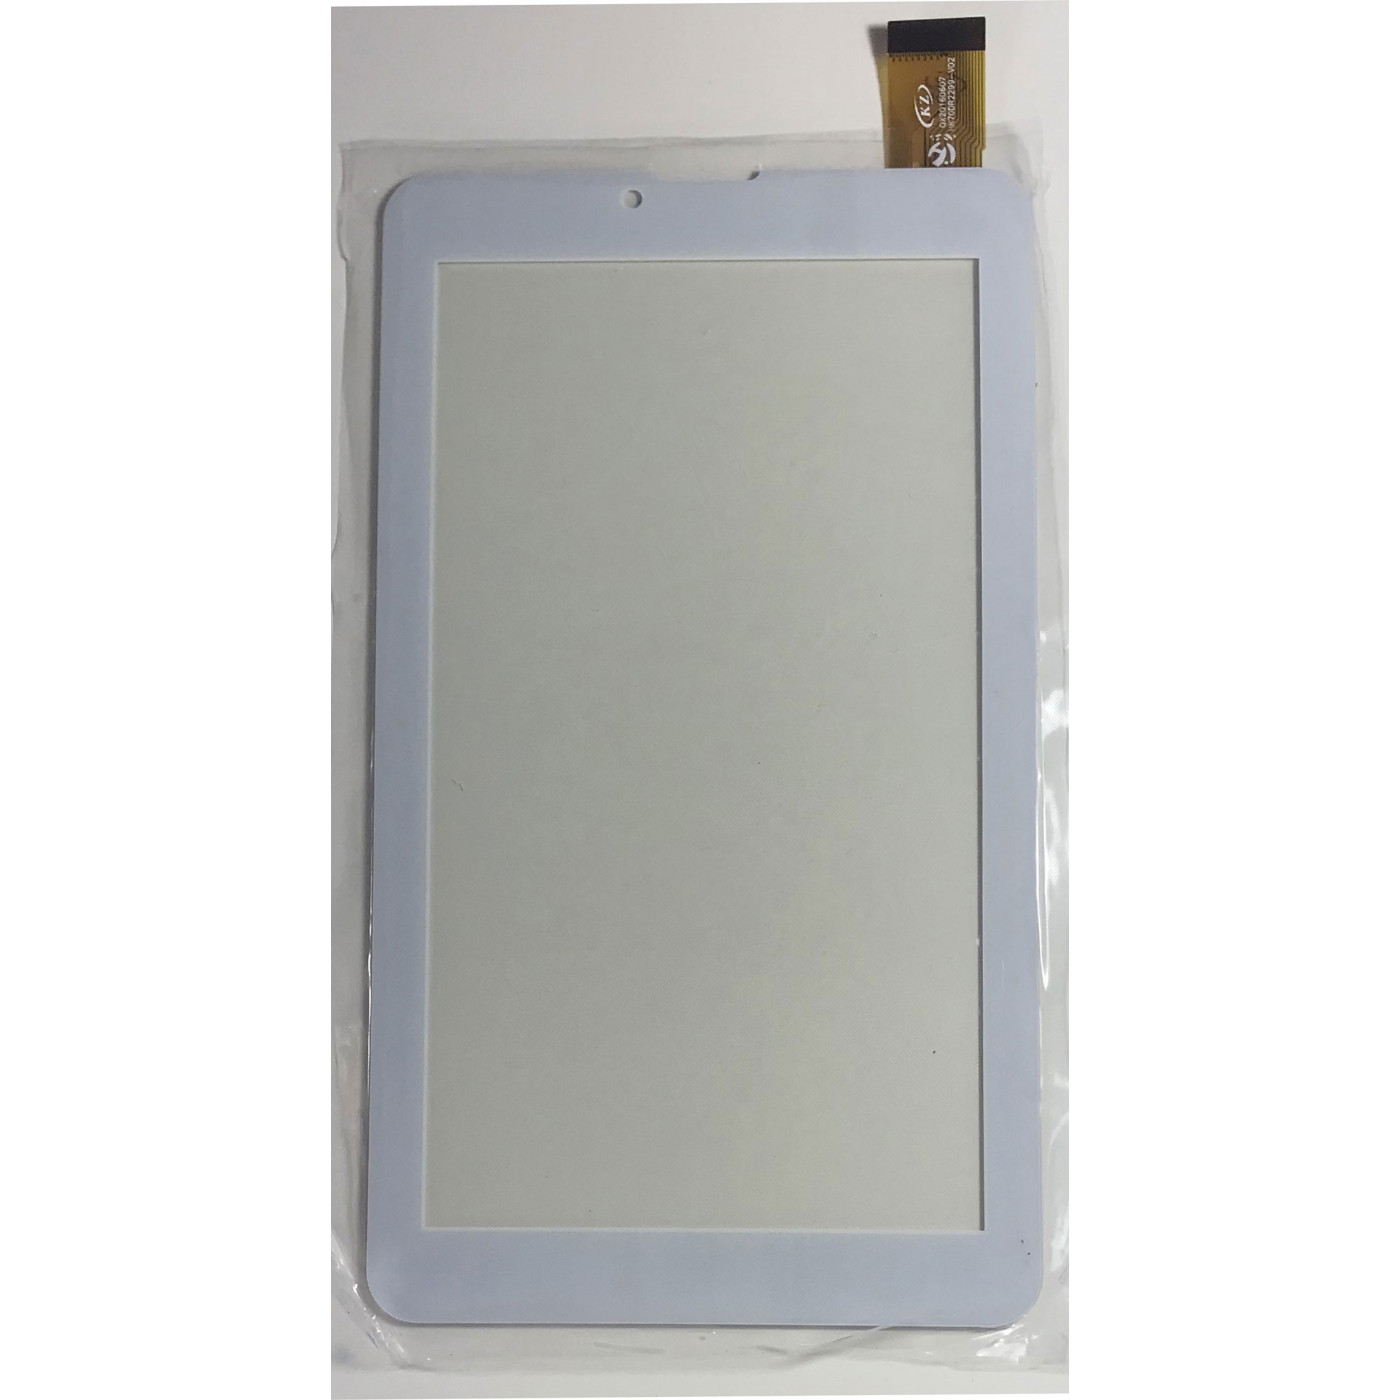 ECRAN TACTILE Pour Majestic TAB-386 HD 3G GLASS Tablet Digitizer 7.0 Blanc